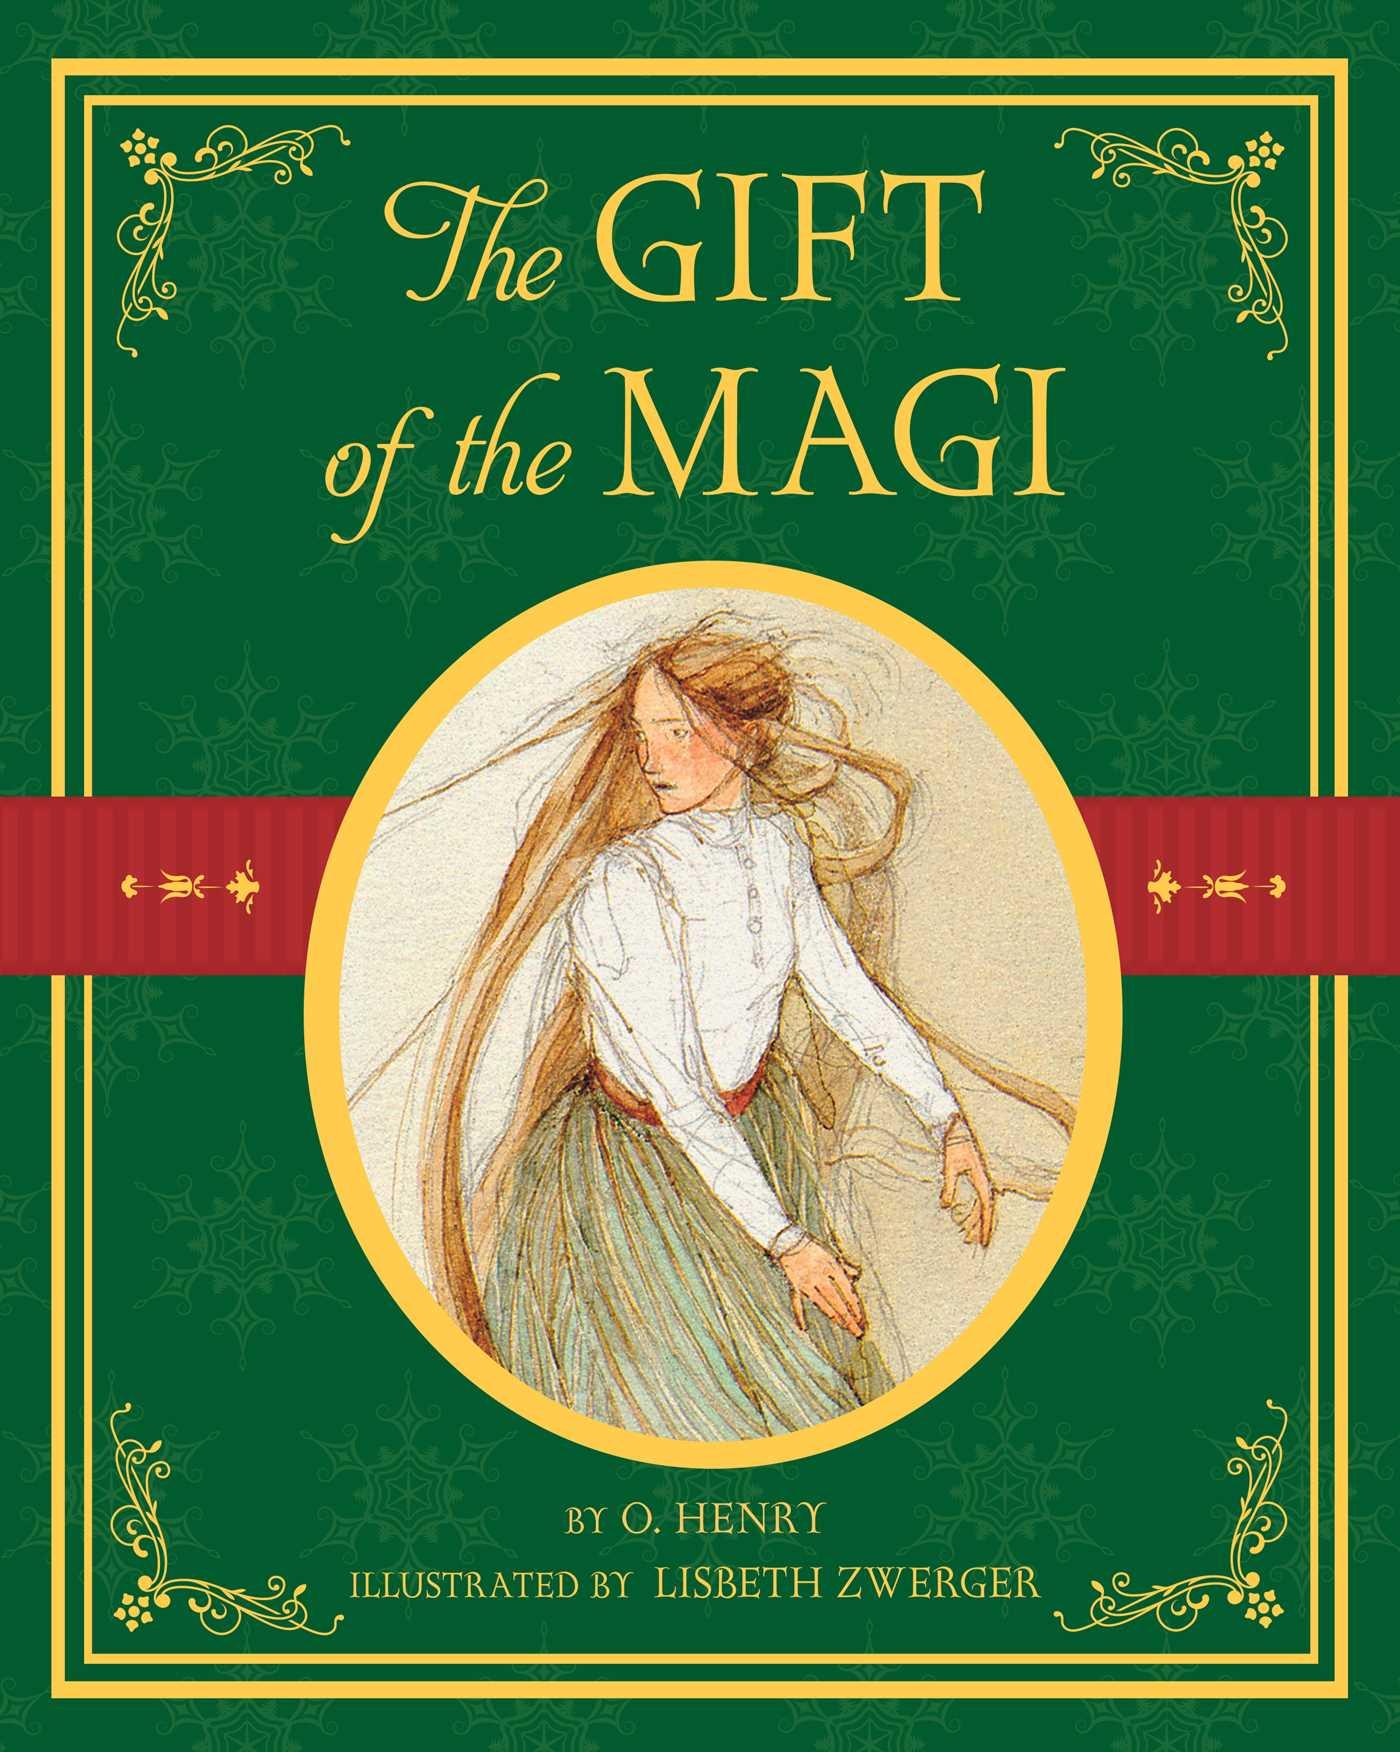 the gift of the magi.jpg